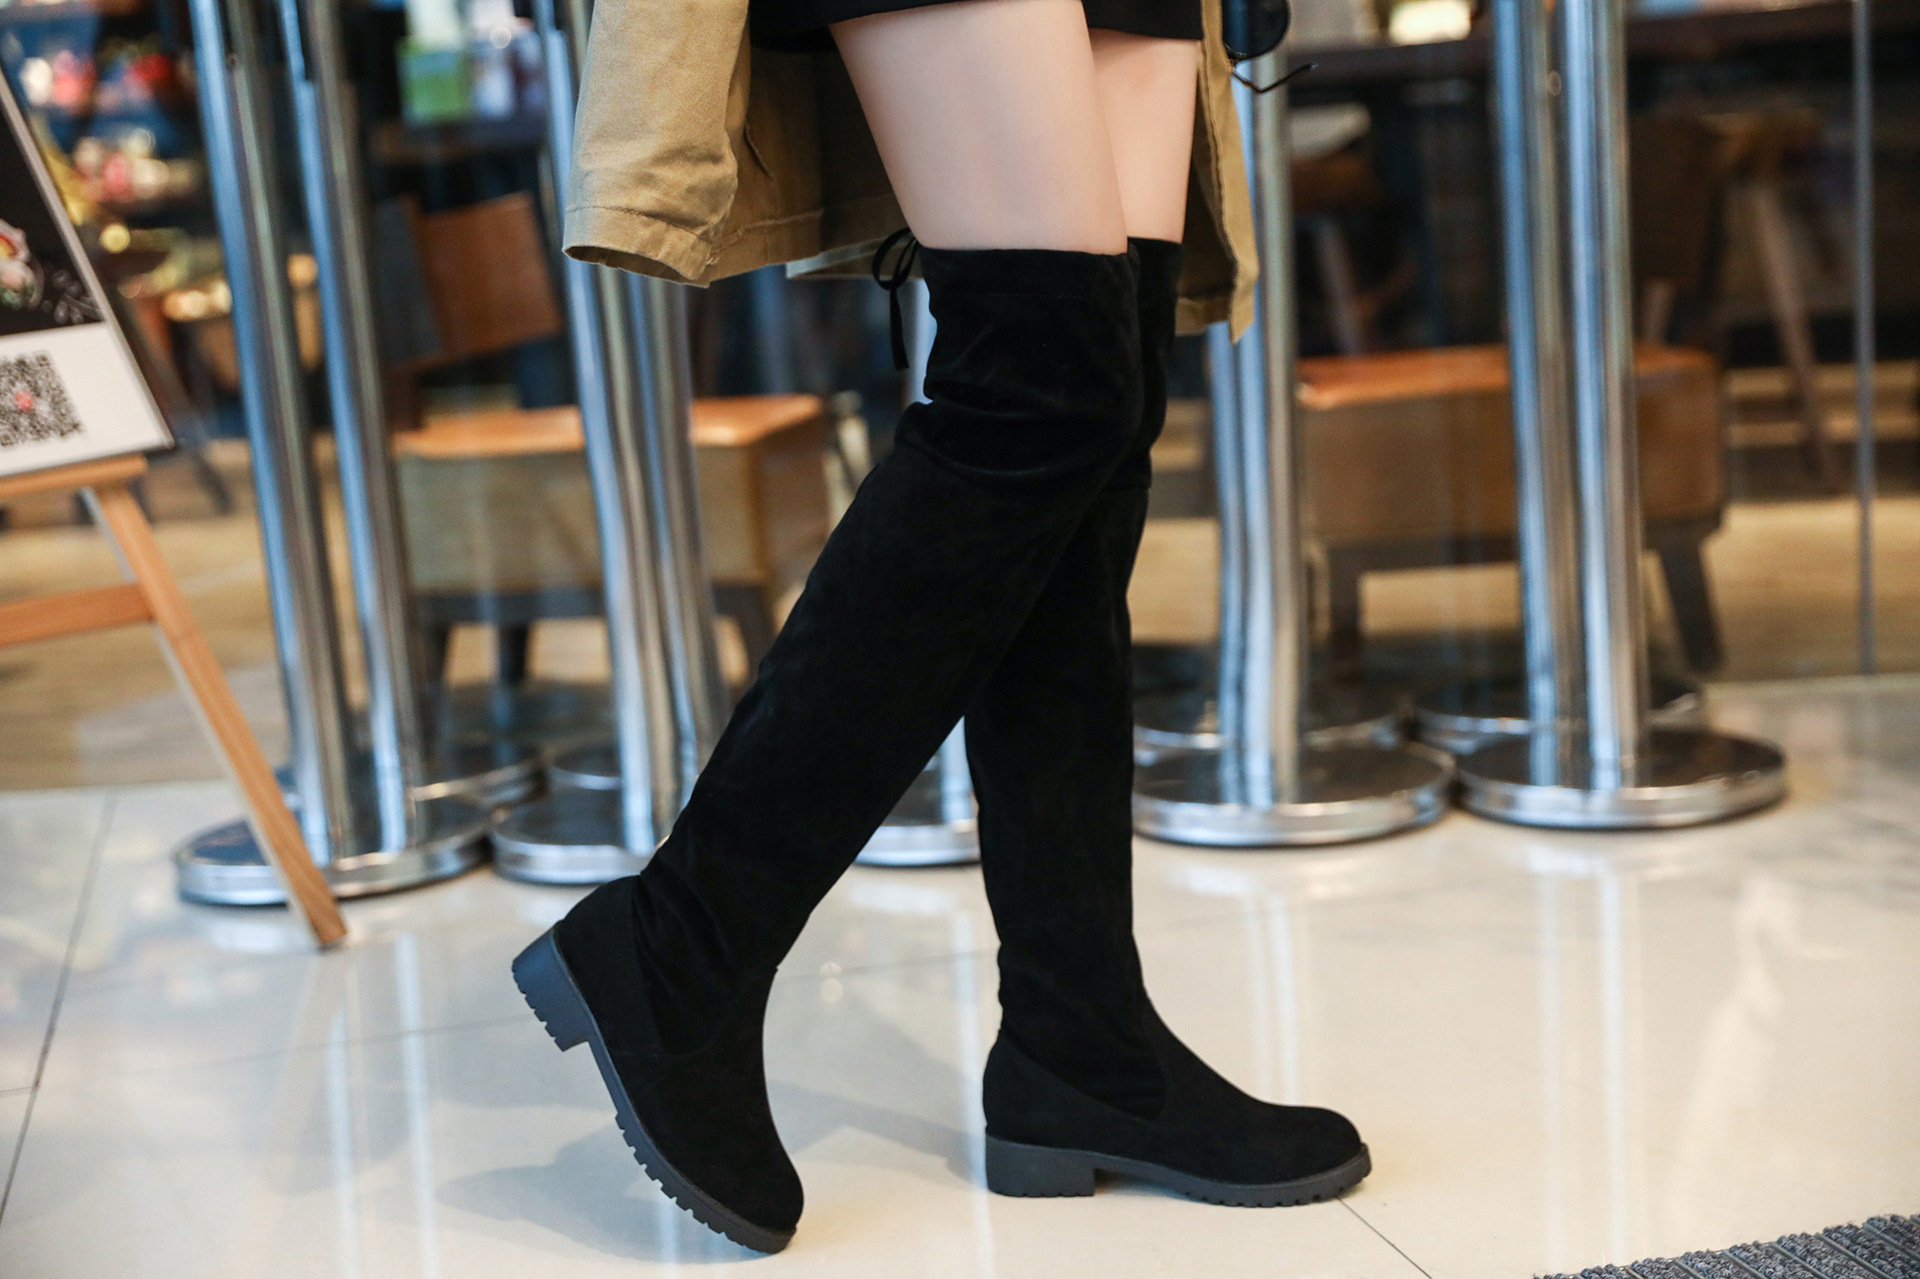 Eshion Girls Knee High Cotton Socks with Non-Skid Bottom